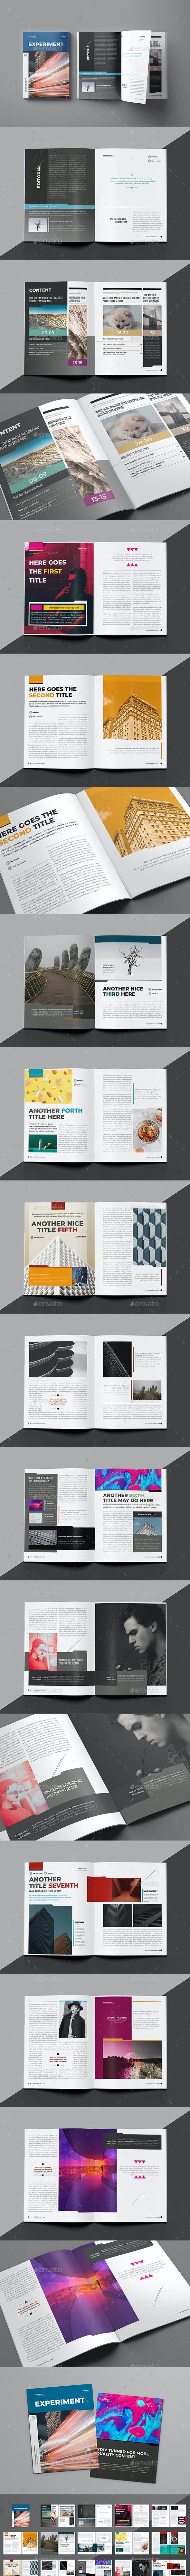 Experiment Magazine Template - Magazines Print Templates